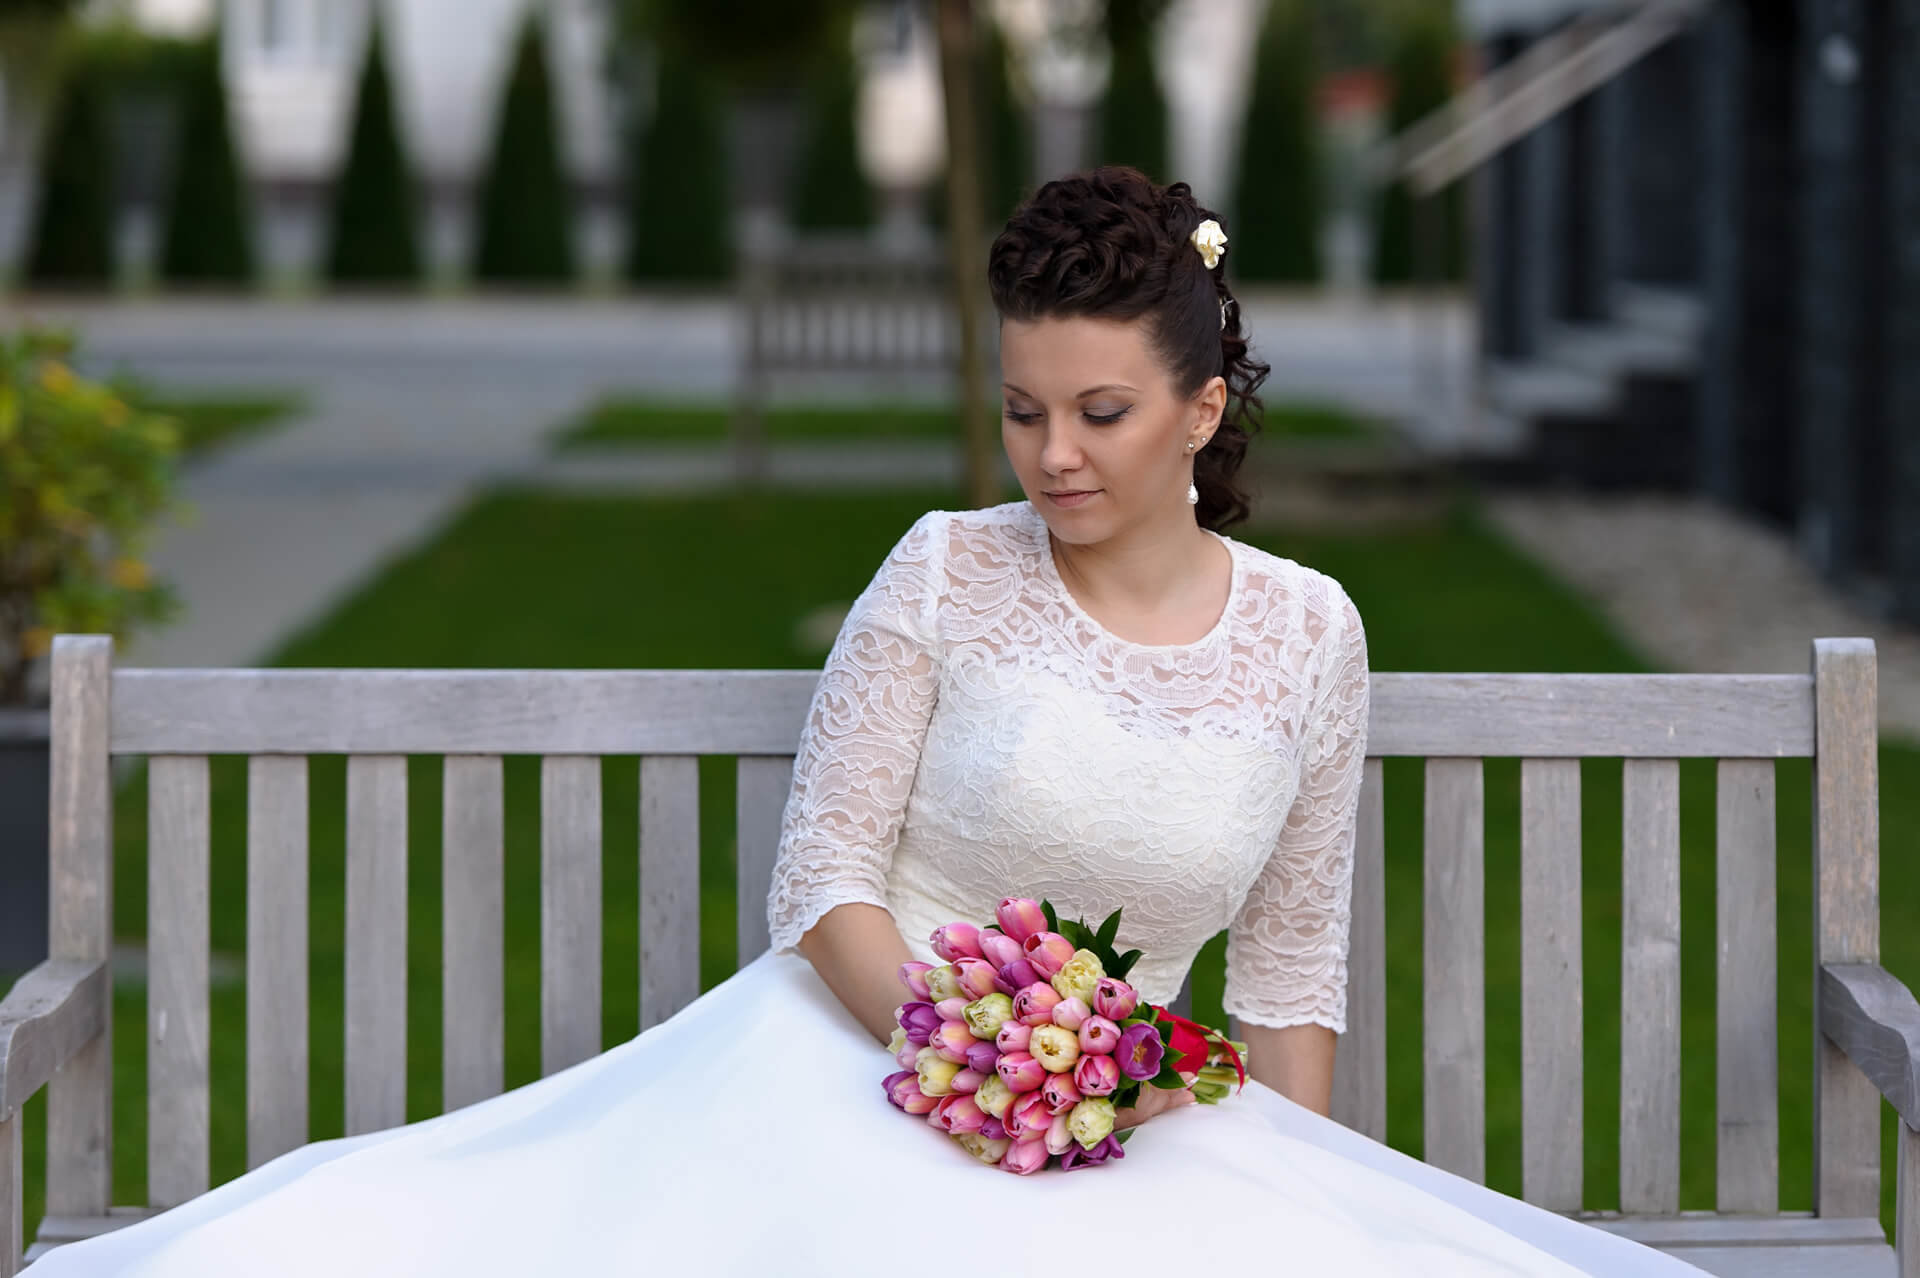 svadba svadobny portrety profesionalne fotenie fotograf Peter Norulak Kosice__12